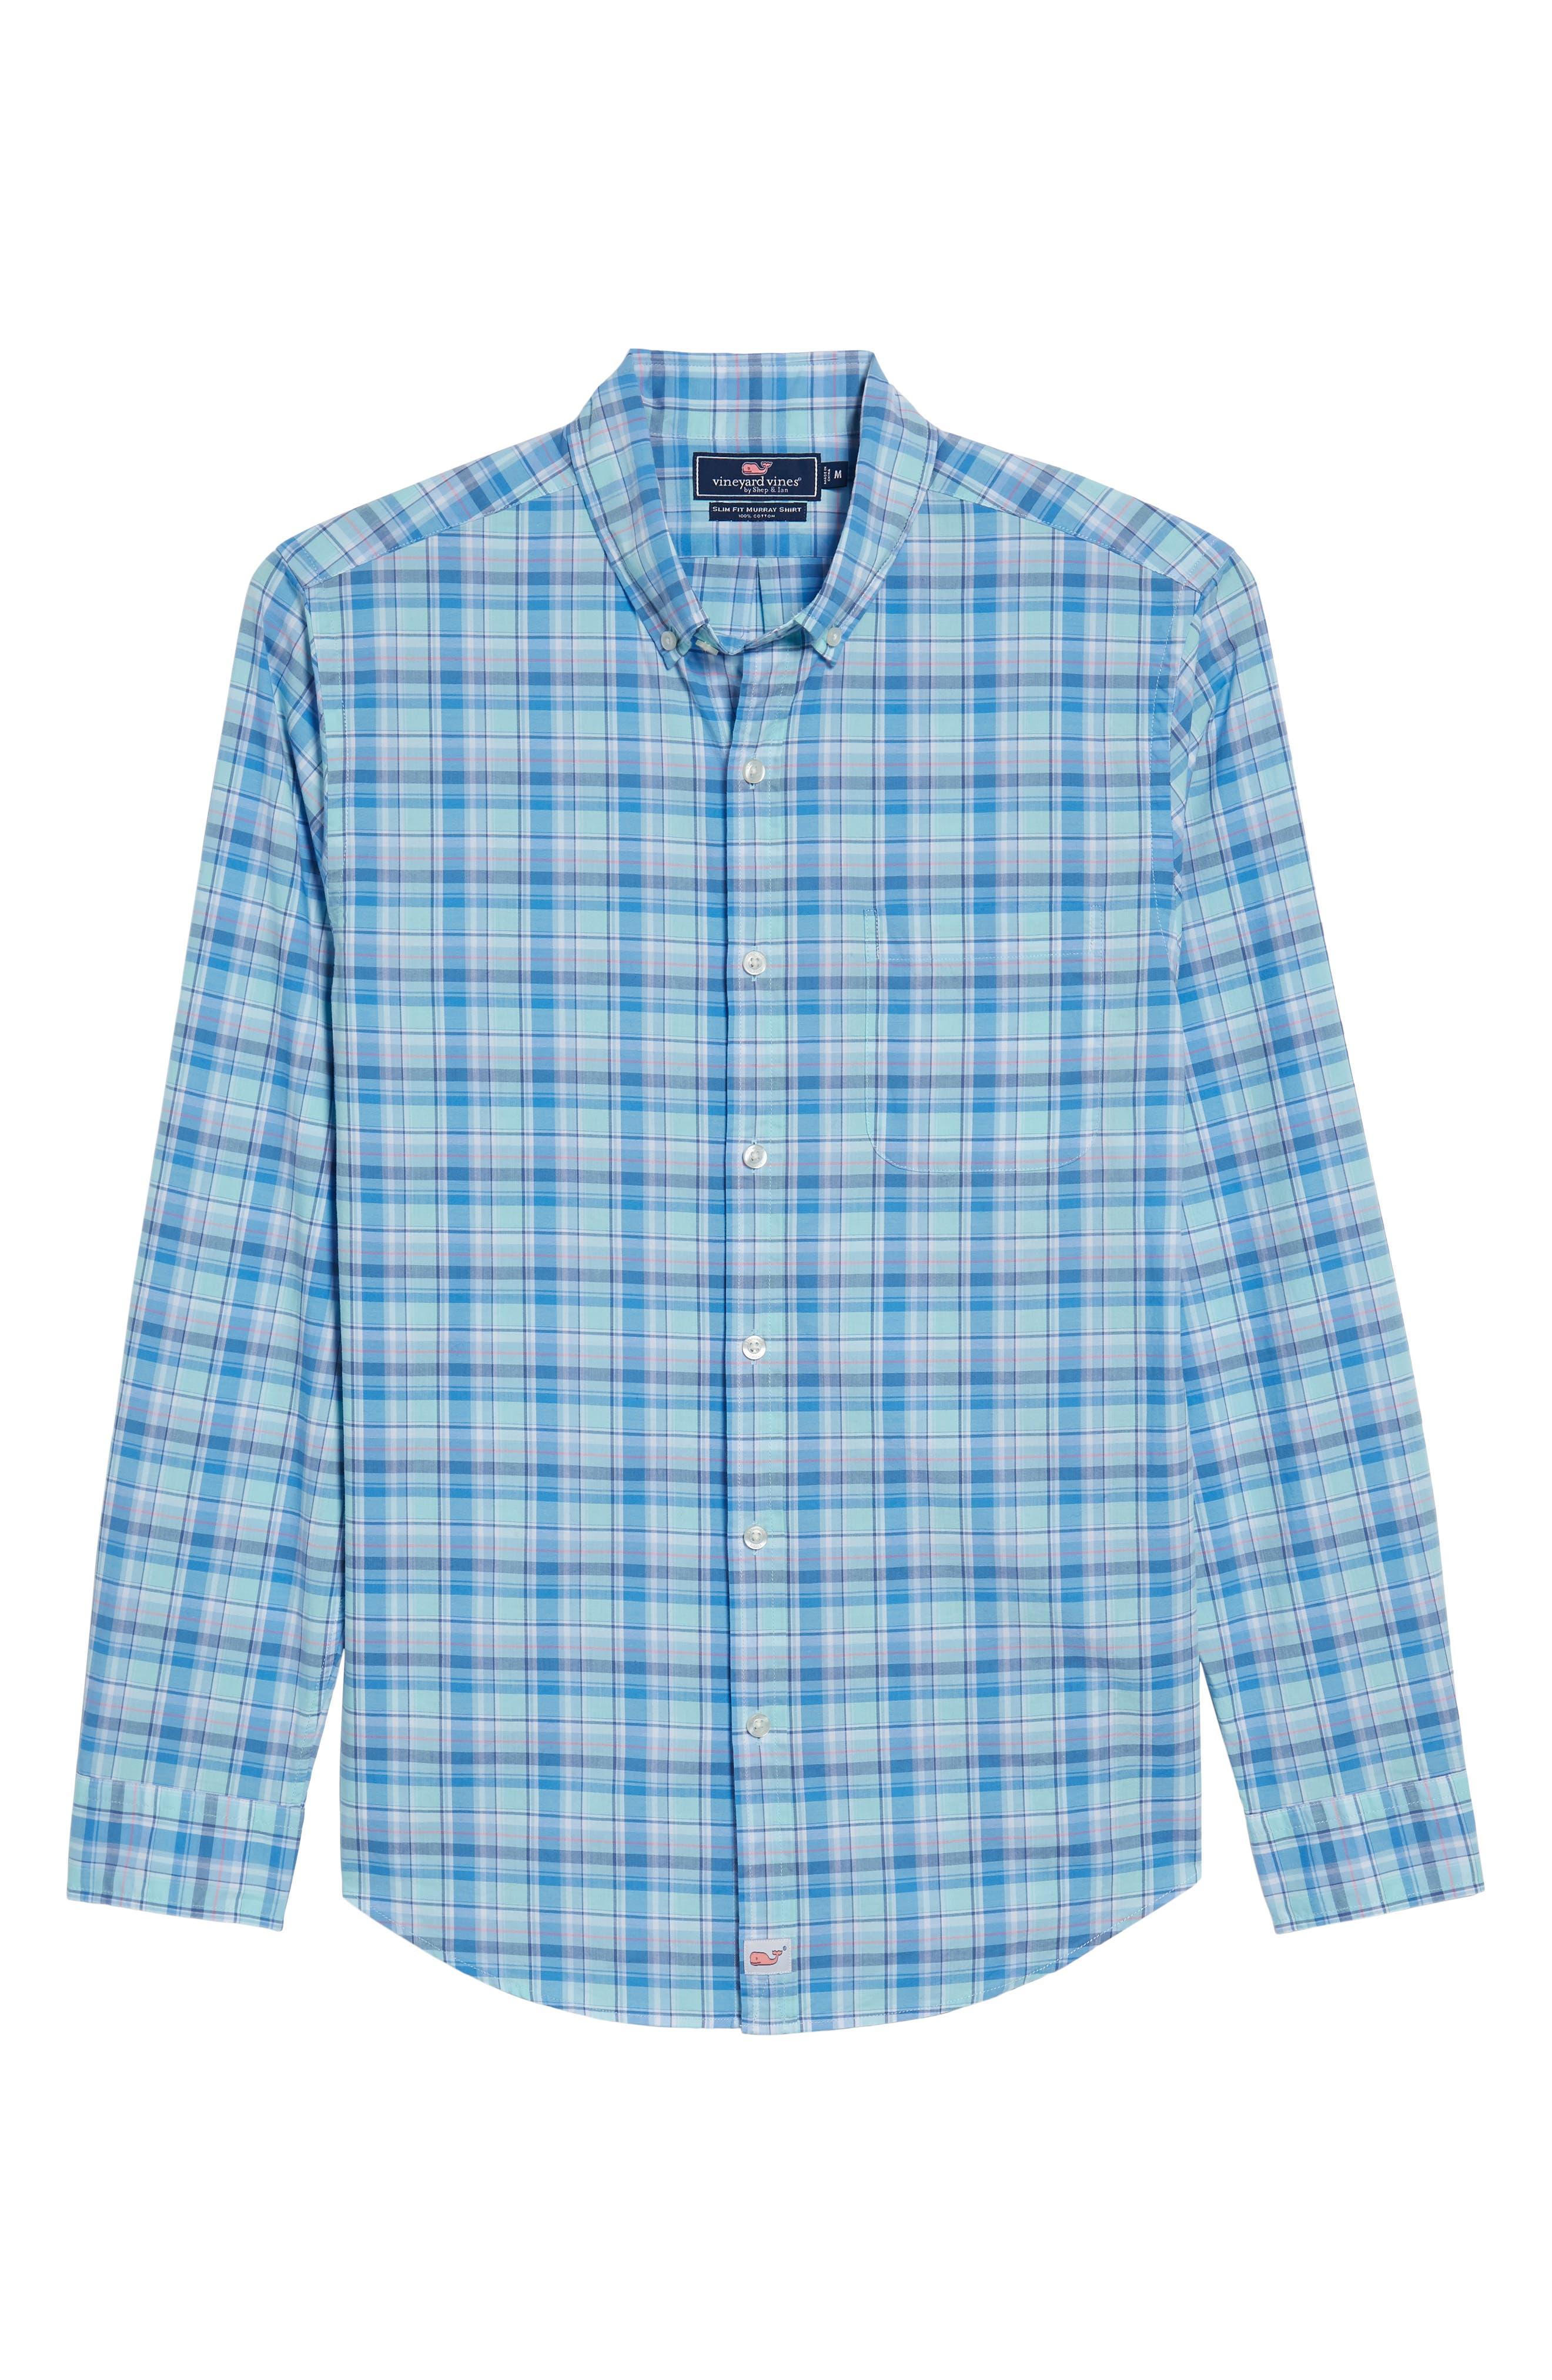 Murray Pine Island Slim Fit Plaid Sport Shirt,                             Alternate thumbnail 6, color,                             Sea Splash